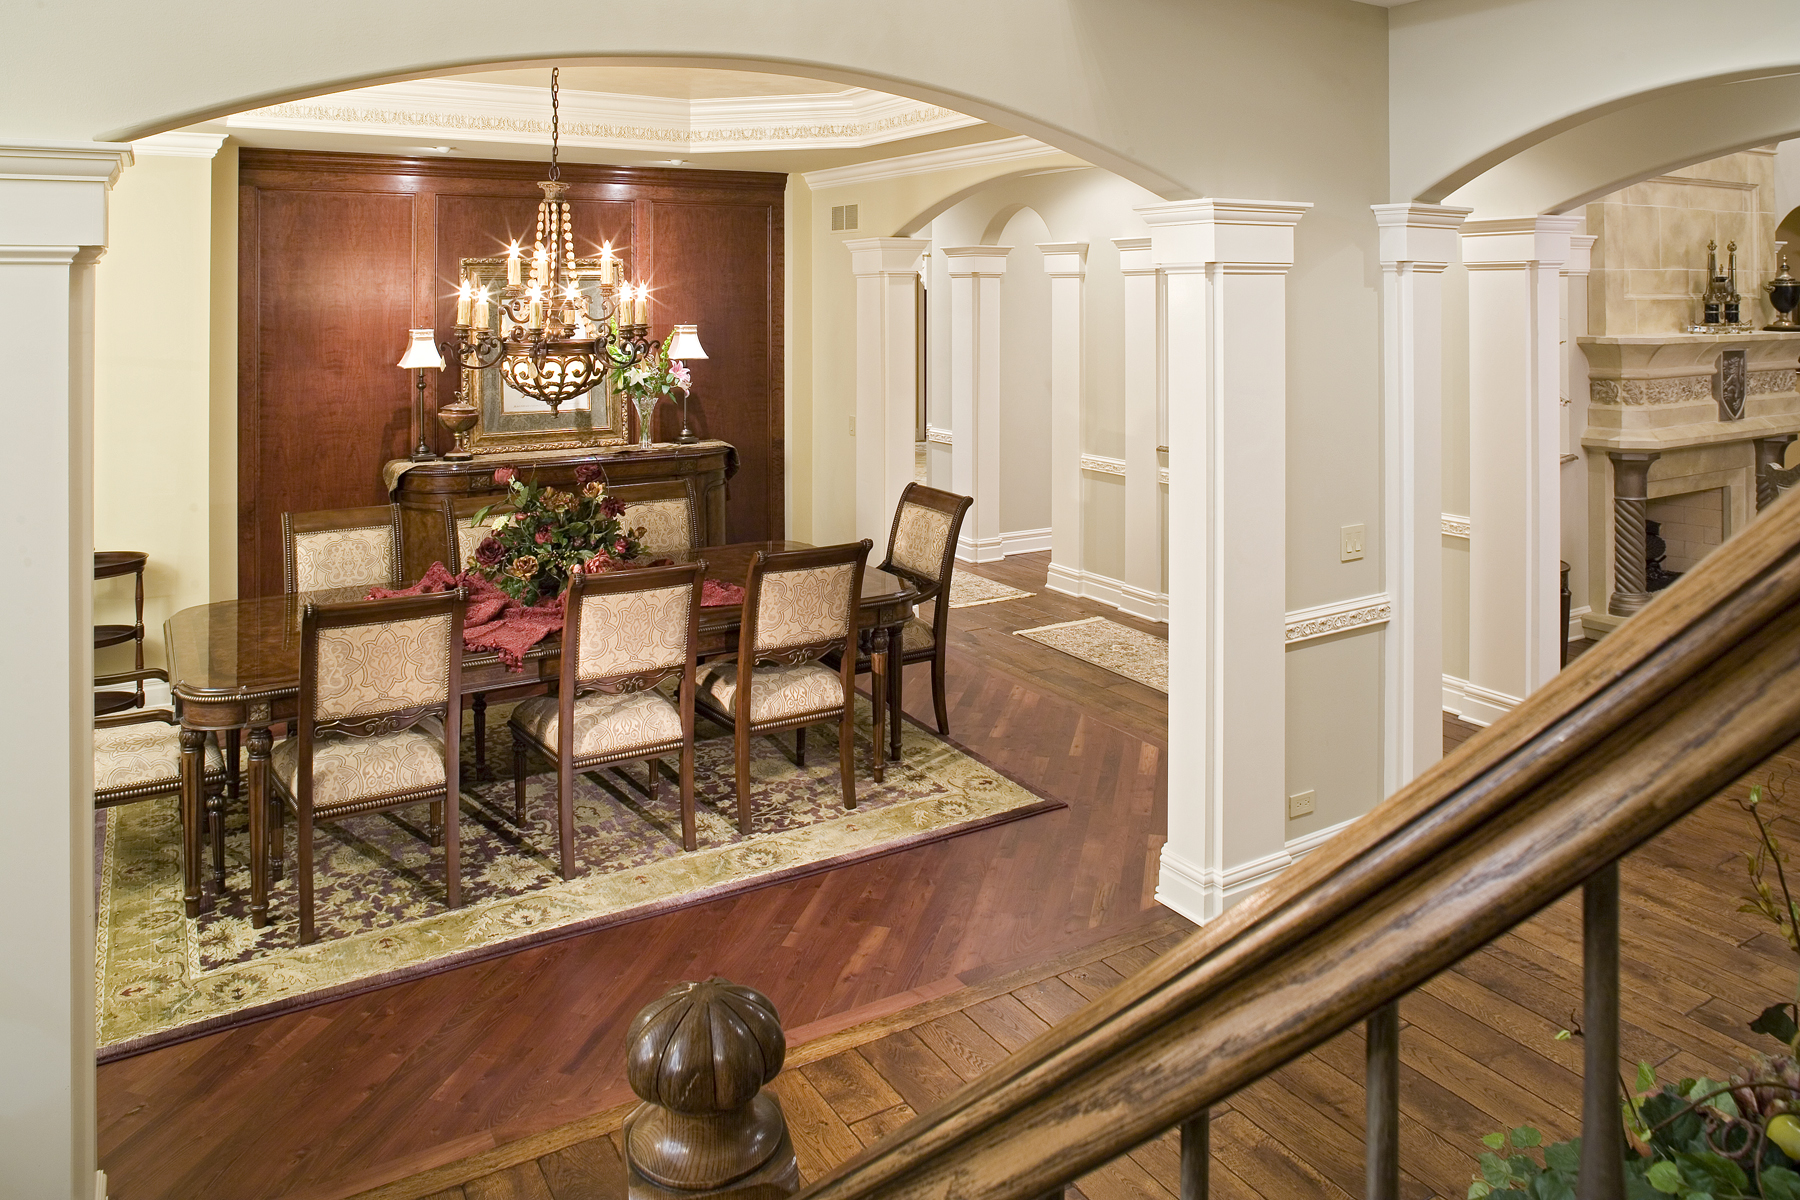 Barrington IL Foyer & Dining Room Remodel